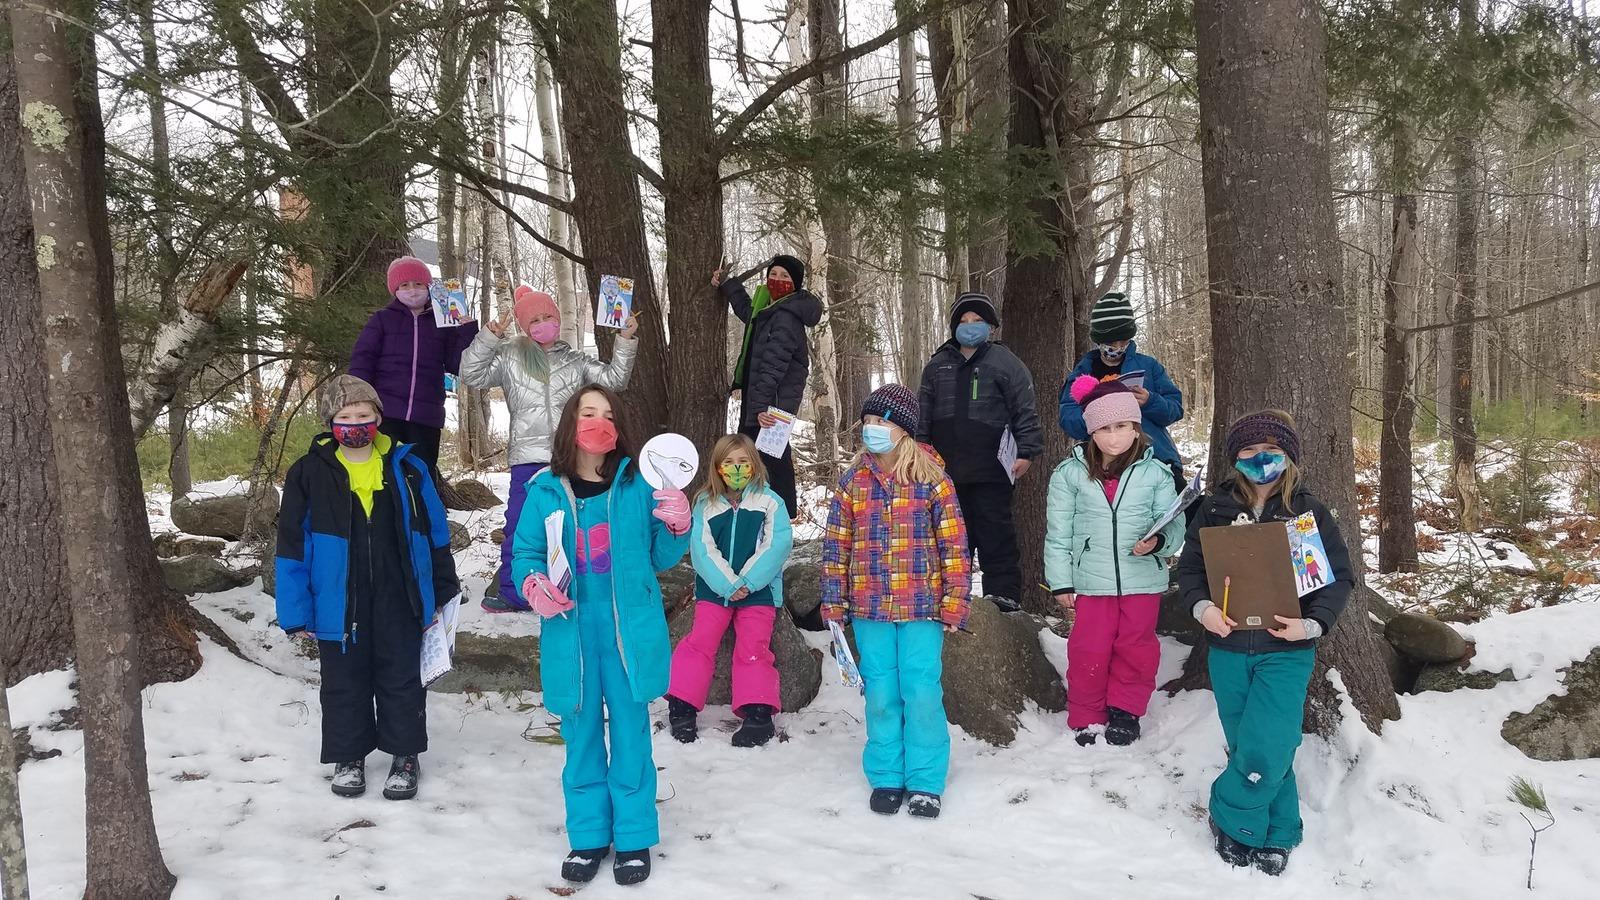 Week 1 3rd Grade Harrison Elementary Winter Games 2021 Moment of the Week